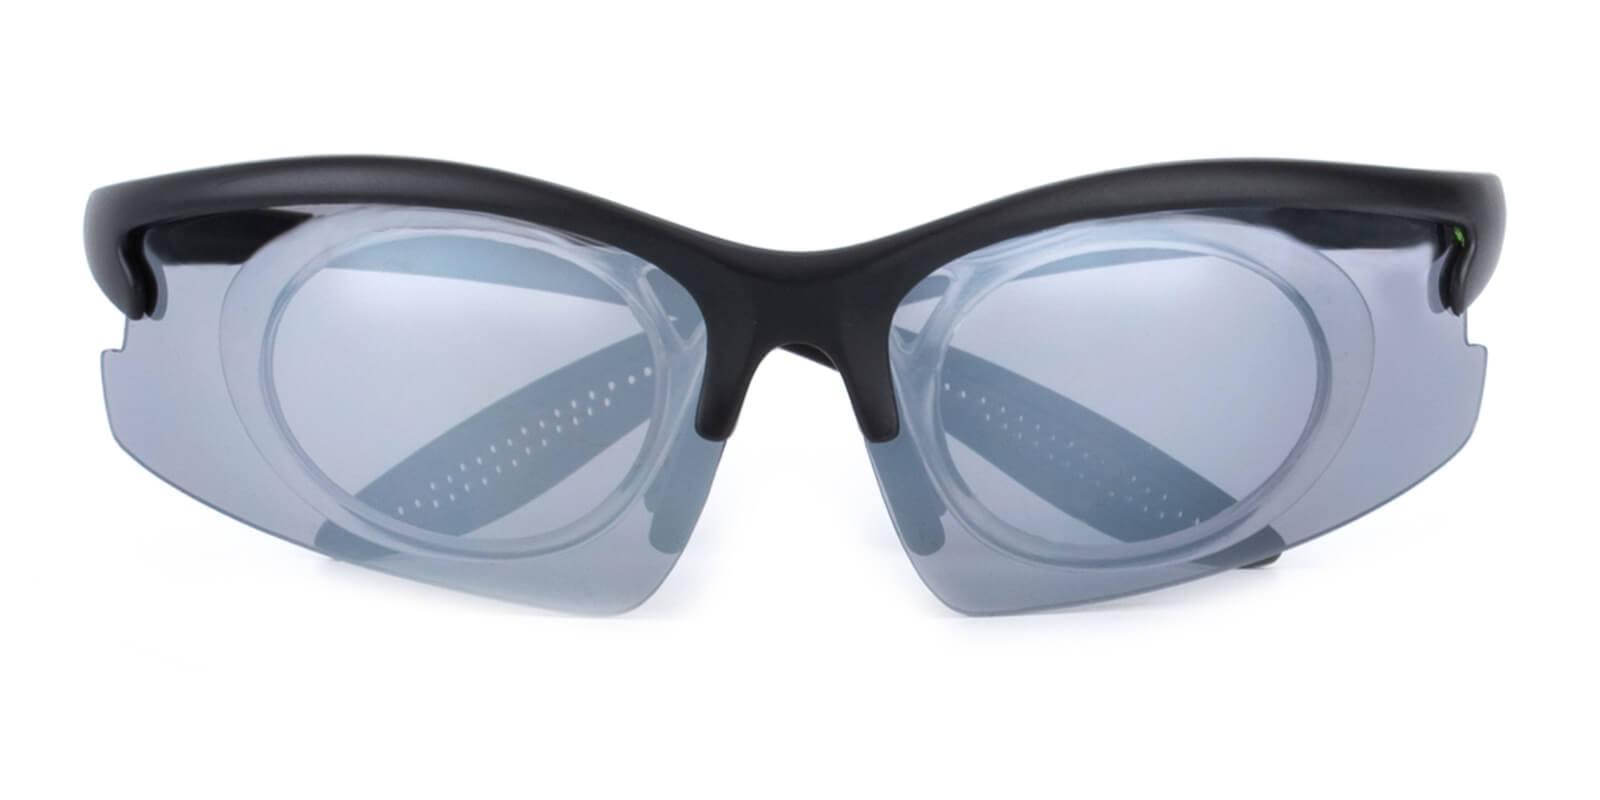 Windrise-Black-Square-Plastic-SportsGlasses-detail